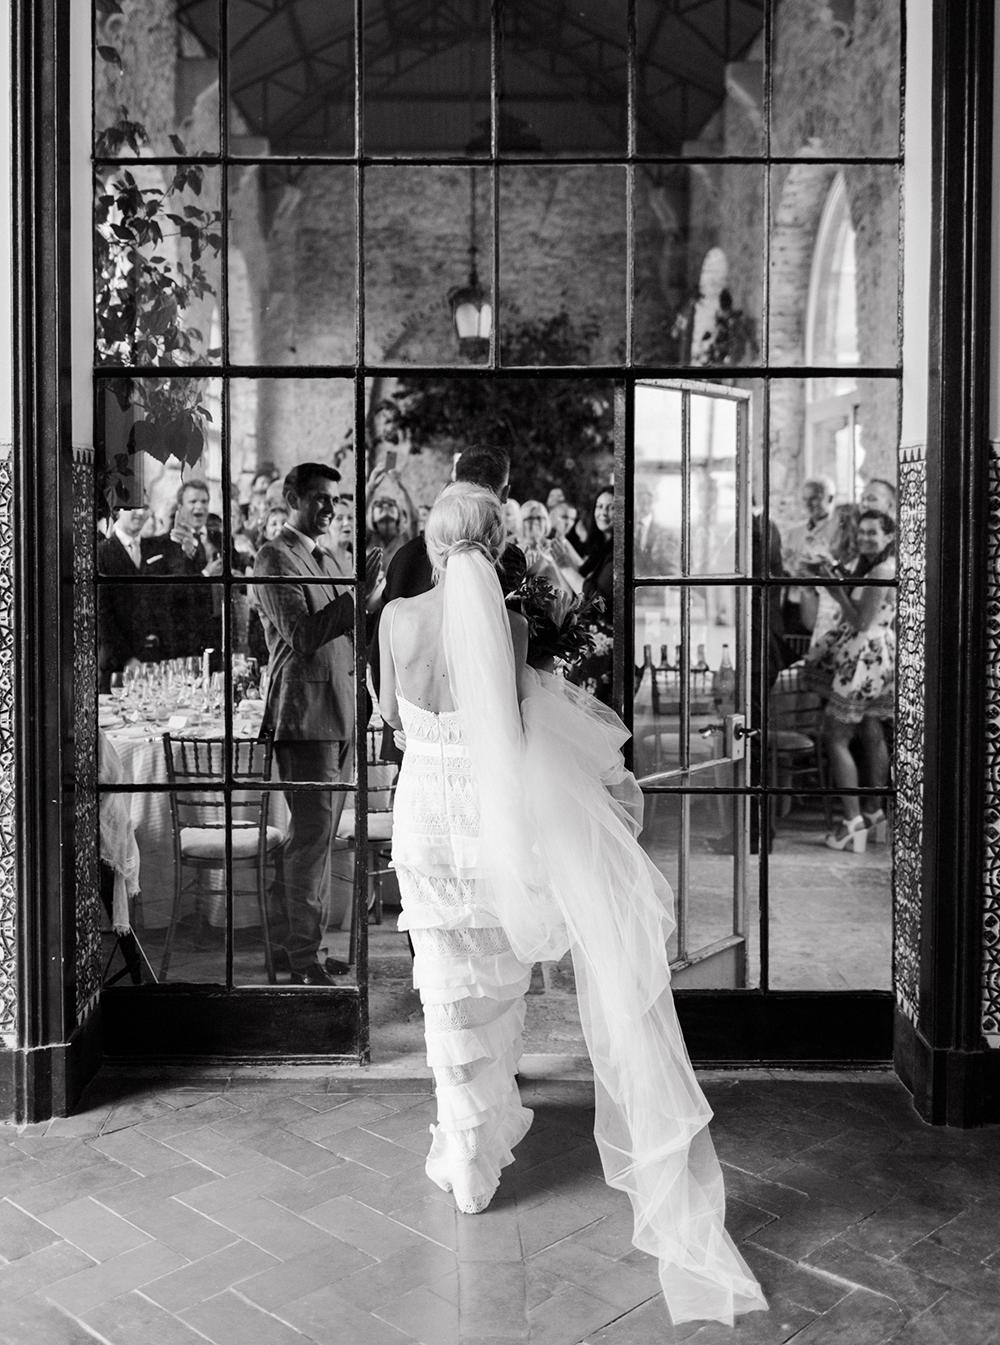 Nastia_Vesna_Photography_Wedding_Portugal_52.jpg